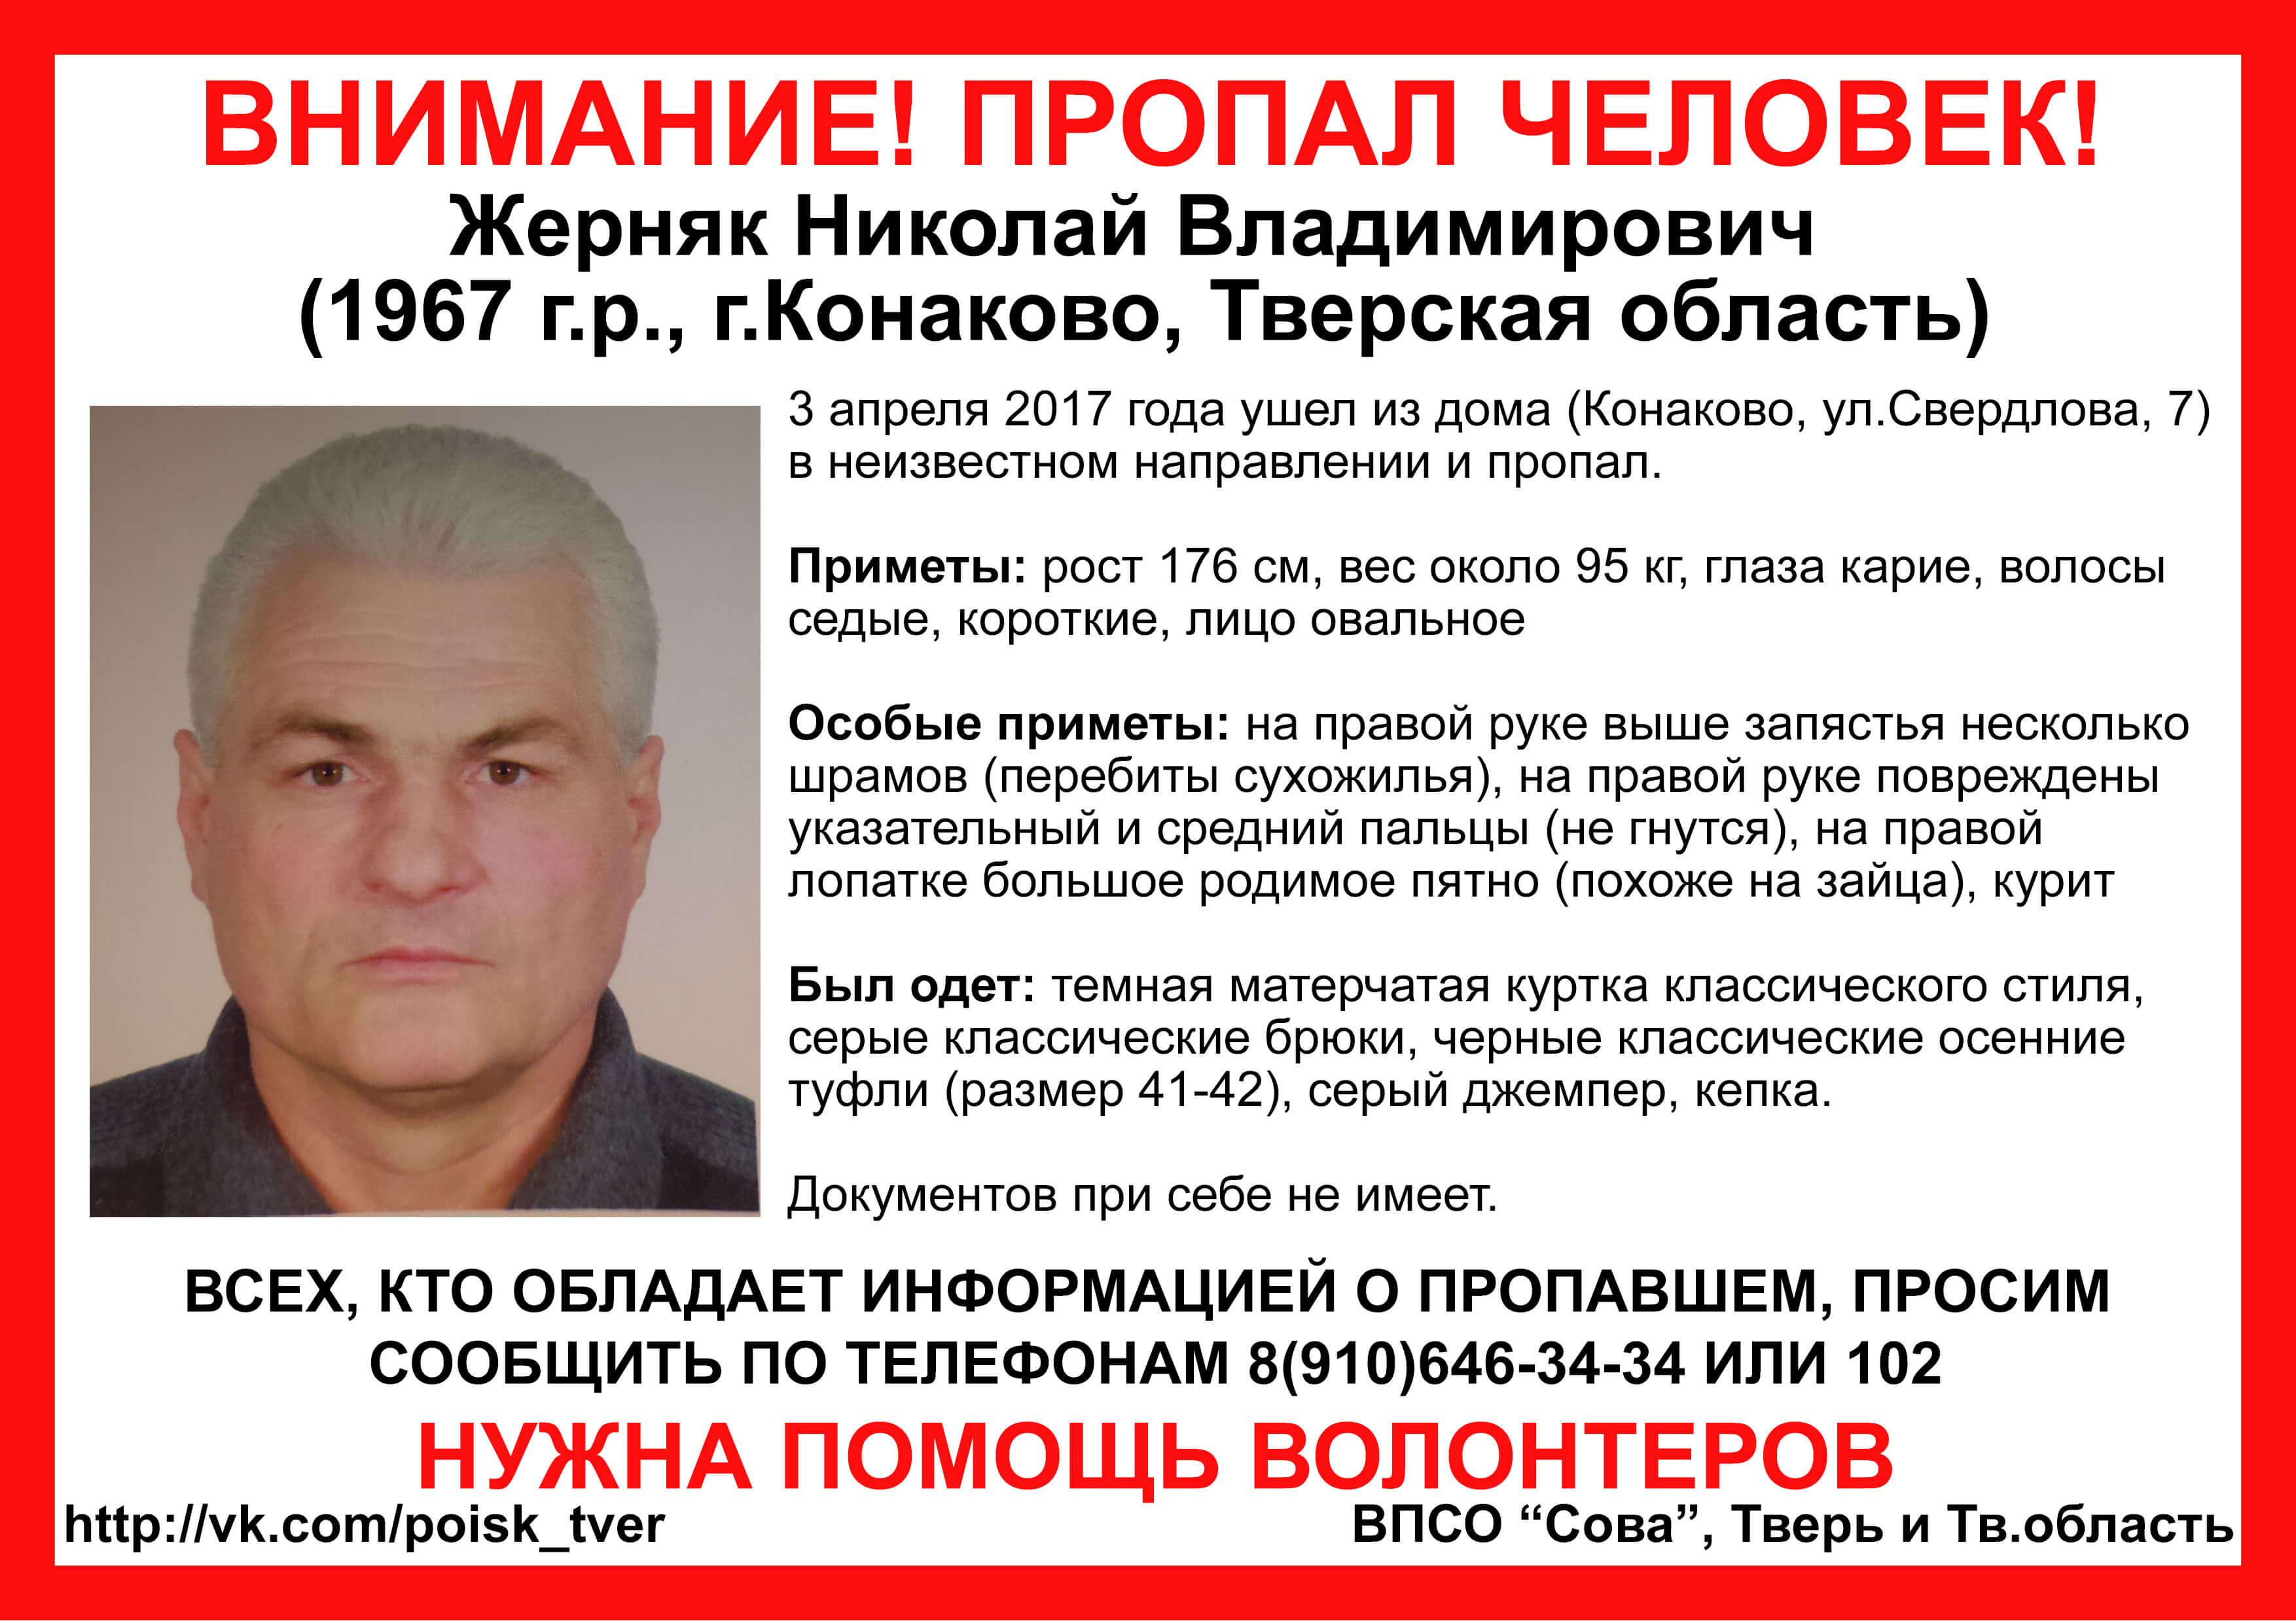 (Найден, жив) В Конаково пропал Николай Жерняк